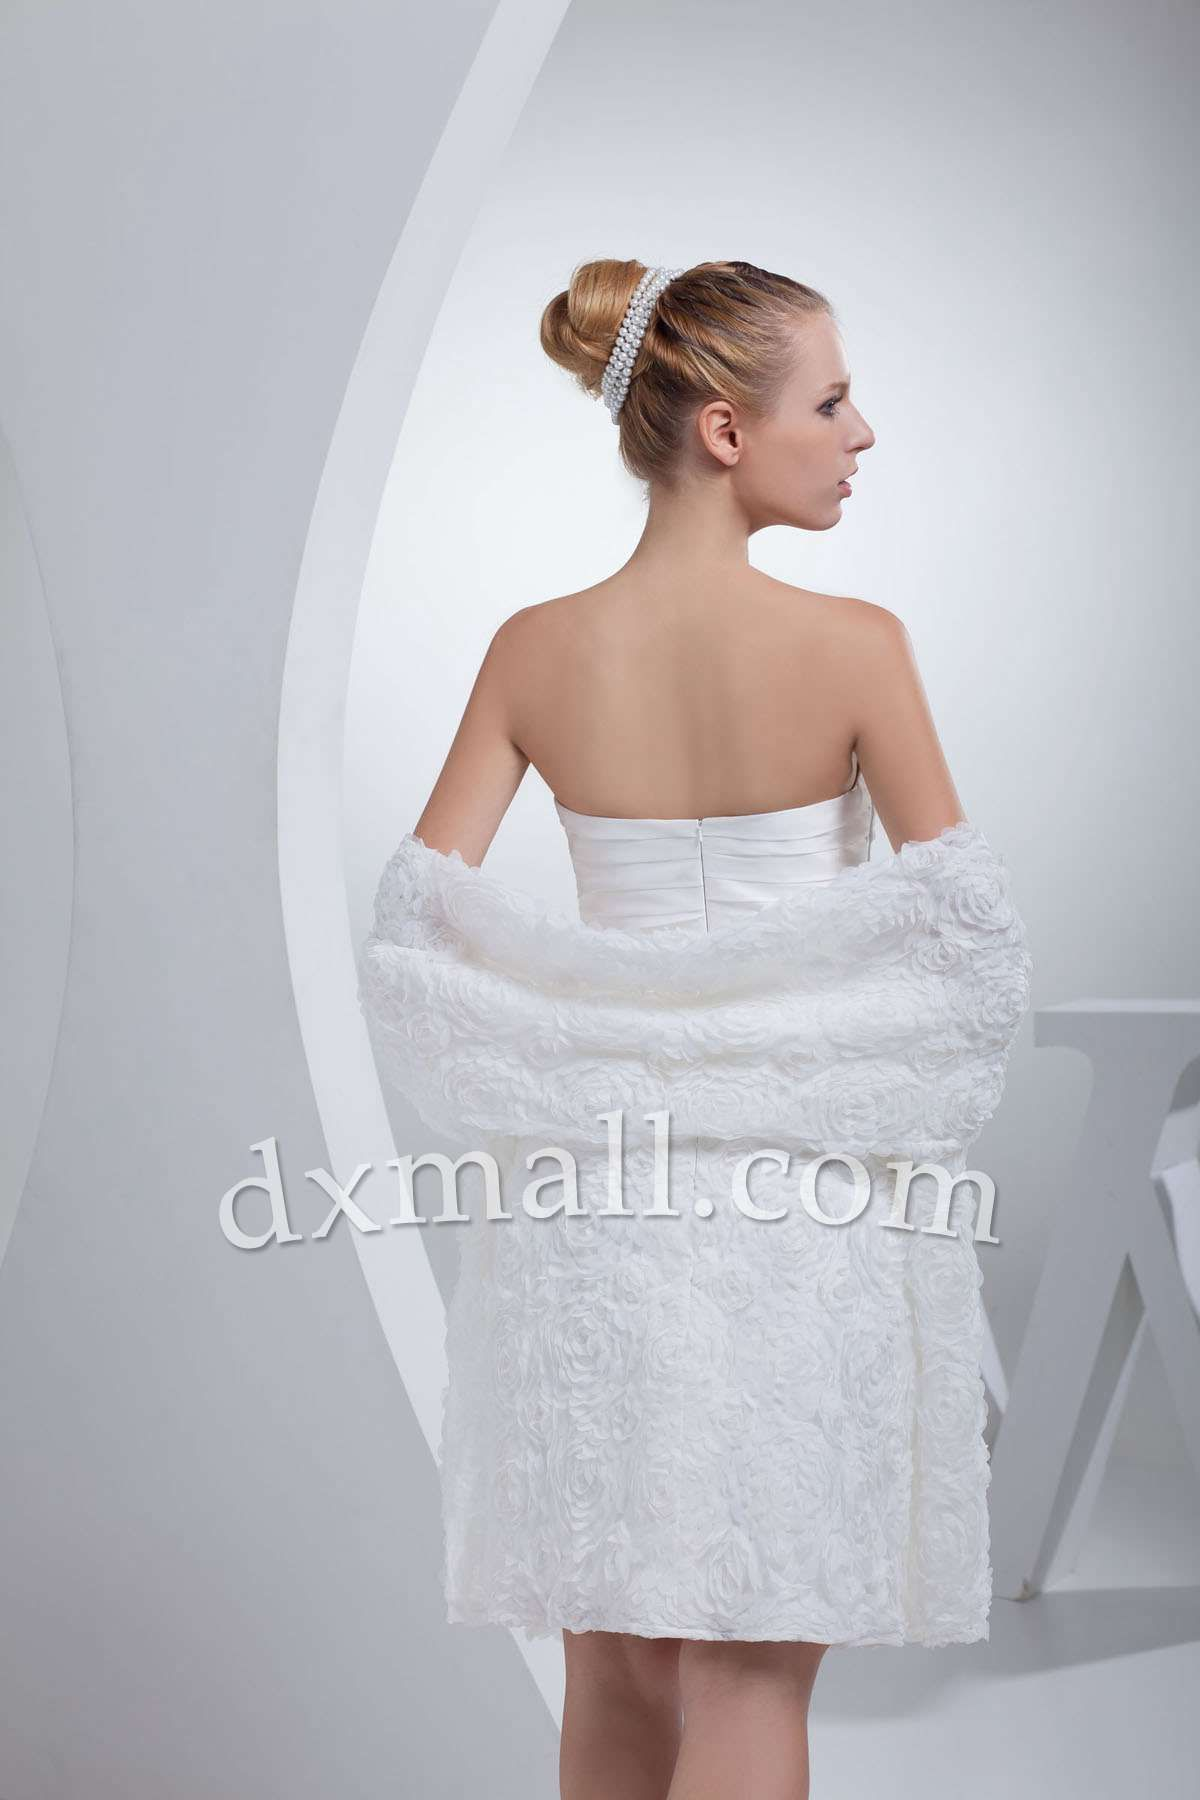 Mini white wedding dress  Aline Wedding Dresses Strapless ShortMini Lace Taffeta White